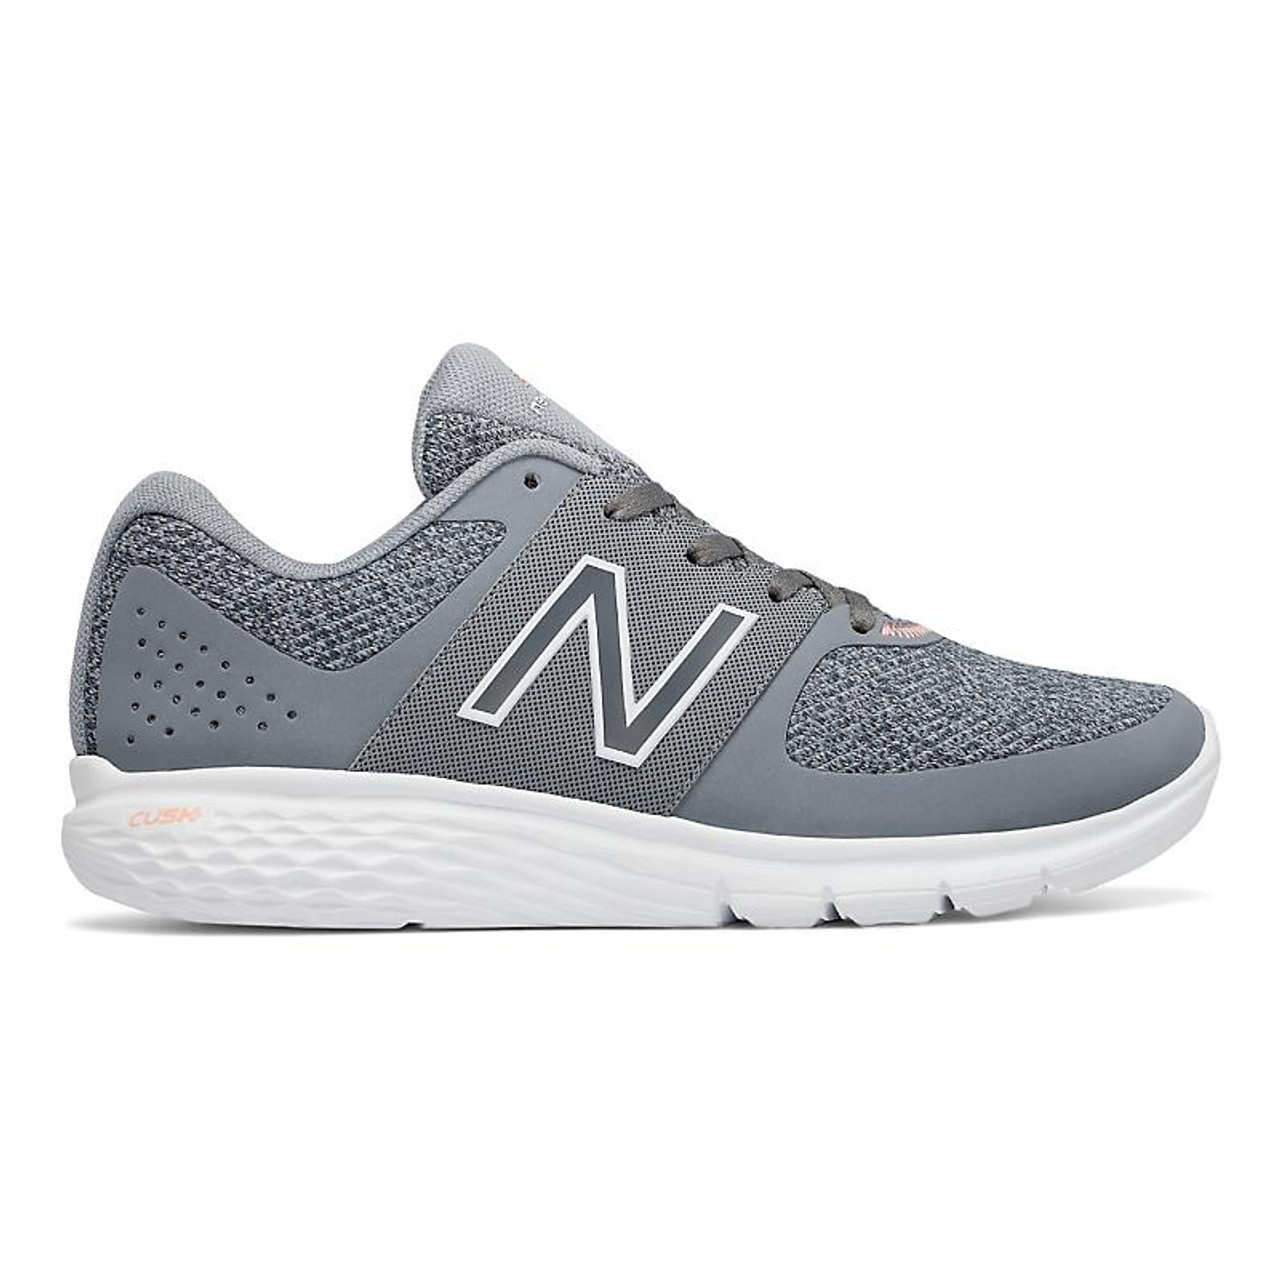 Exklusive Angebote klassische Schuhe Geschicktes Design Women's New Balance 365v1